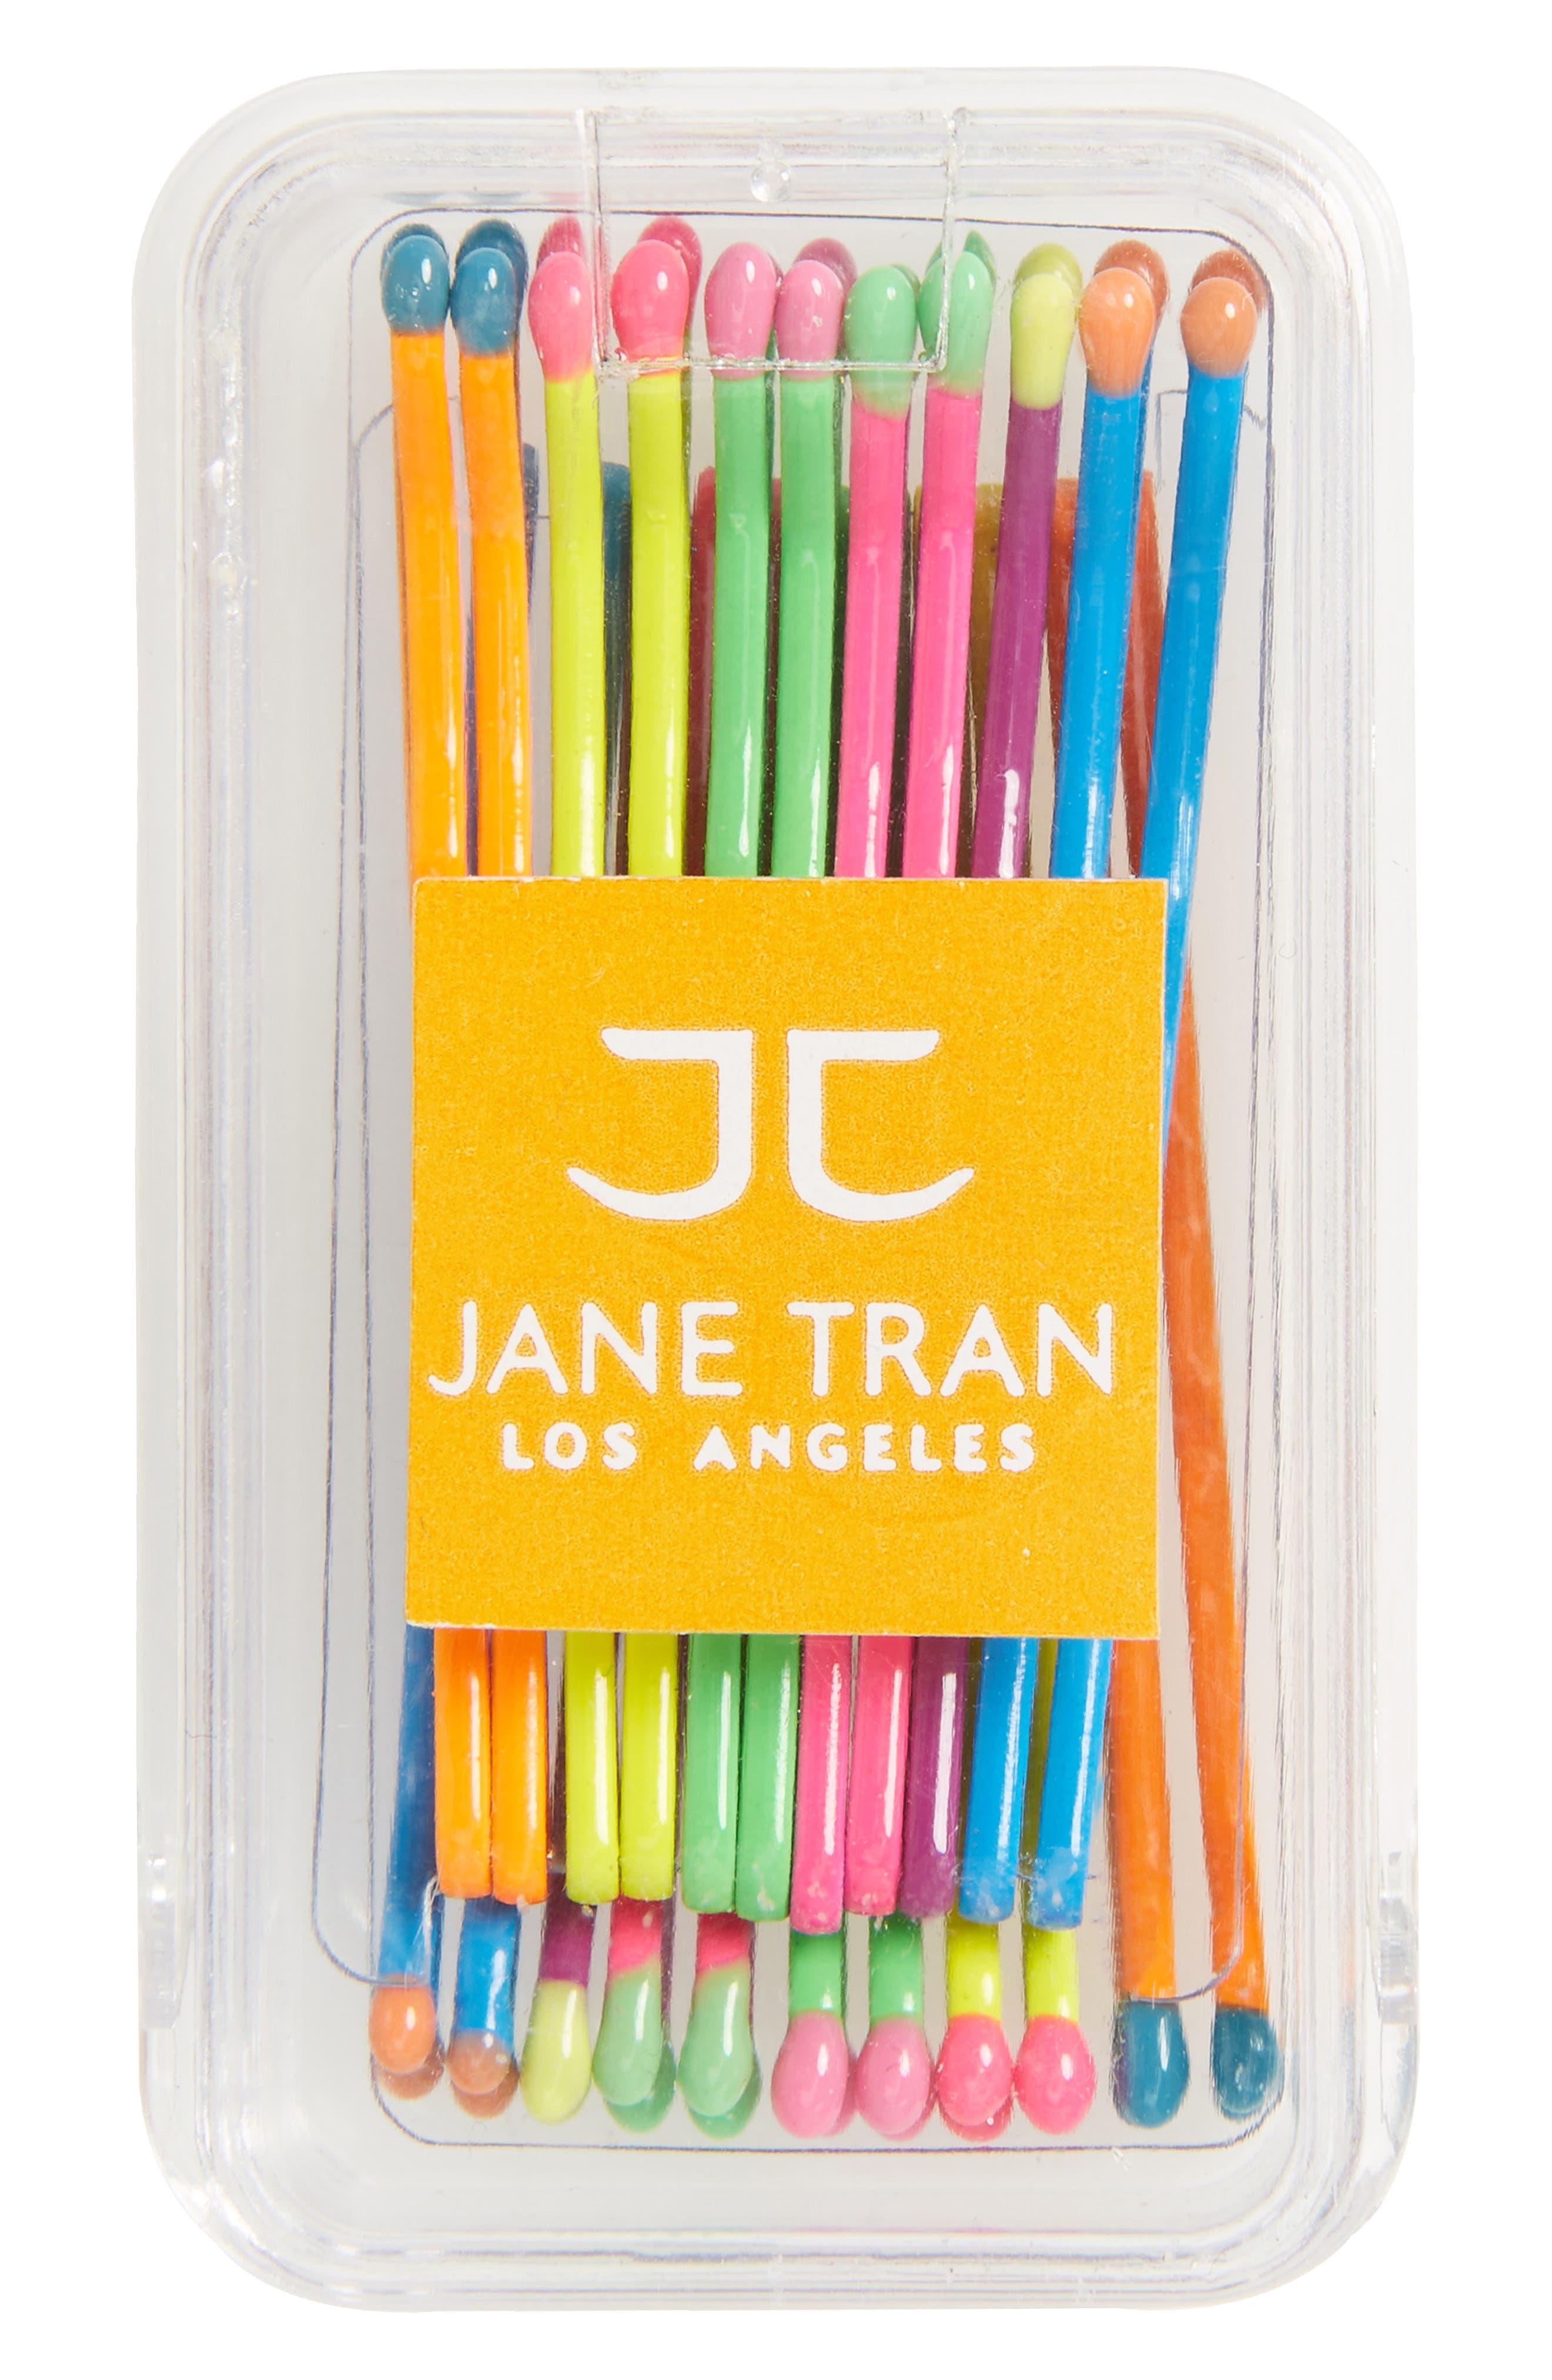 Main Image - Jane Tran Neon Rainbow Matchsticks Set of 20 Assorted Bobby Pins